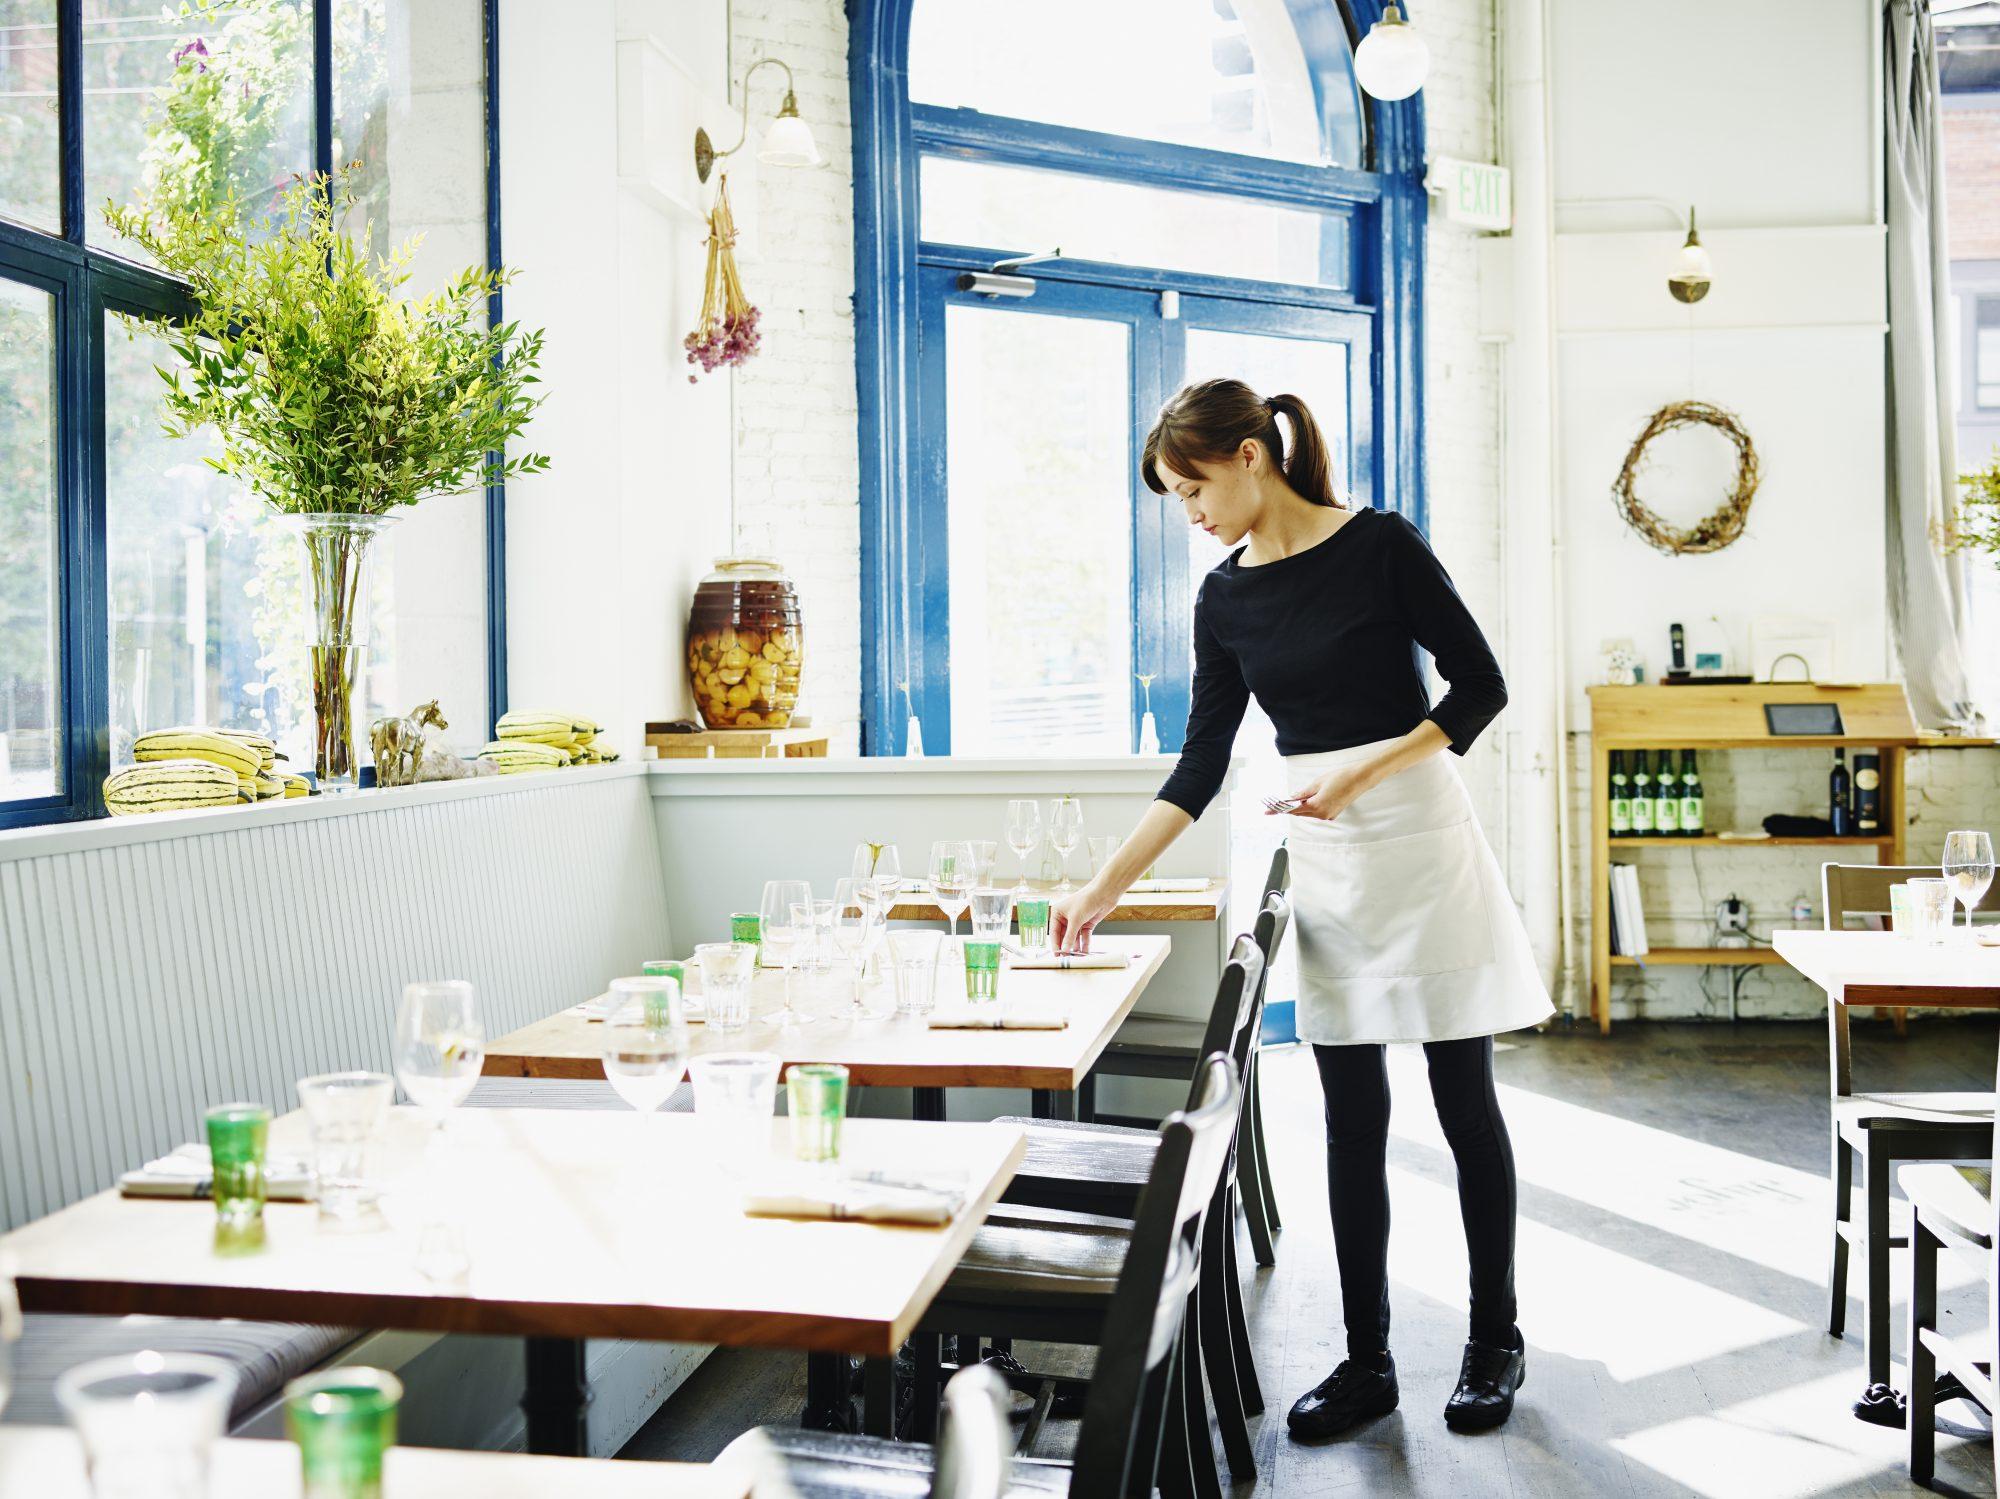 getty-waitress-image